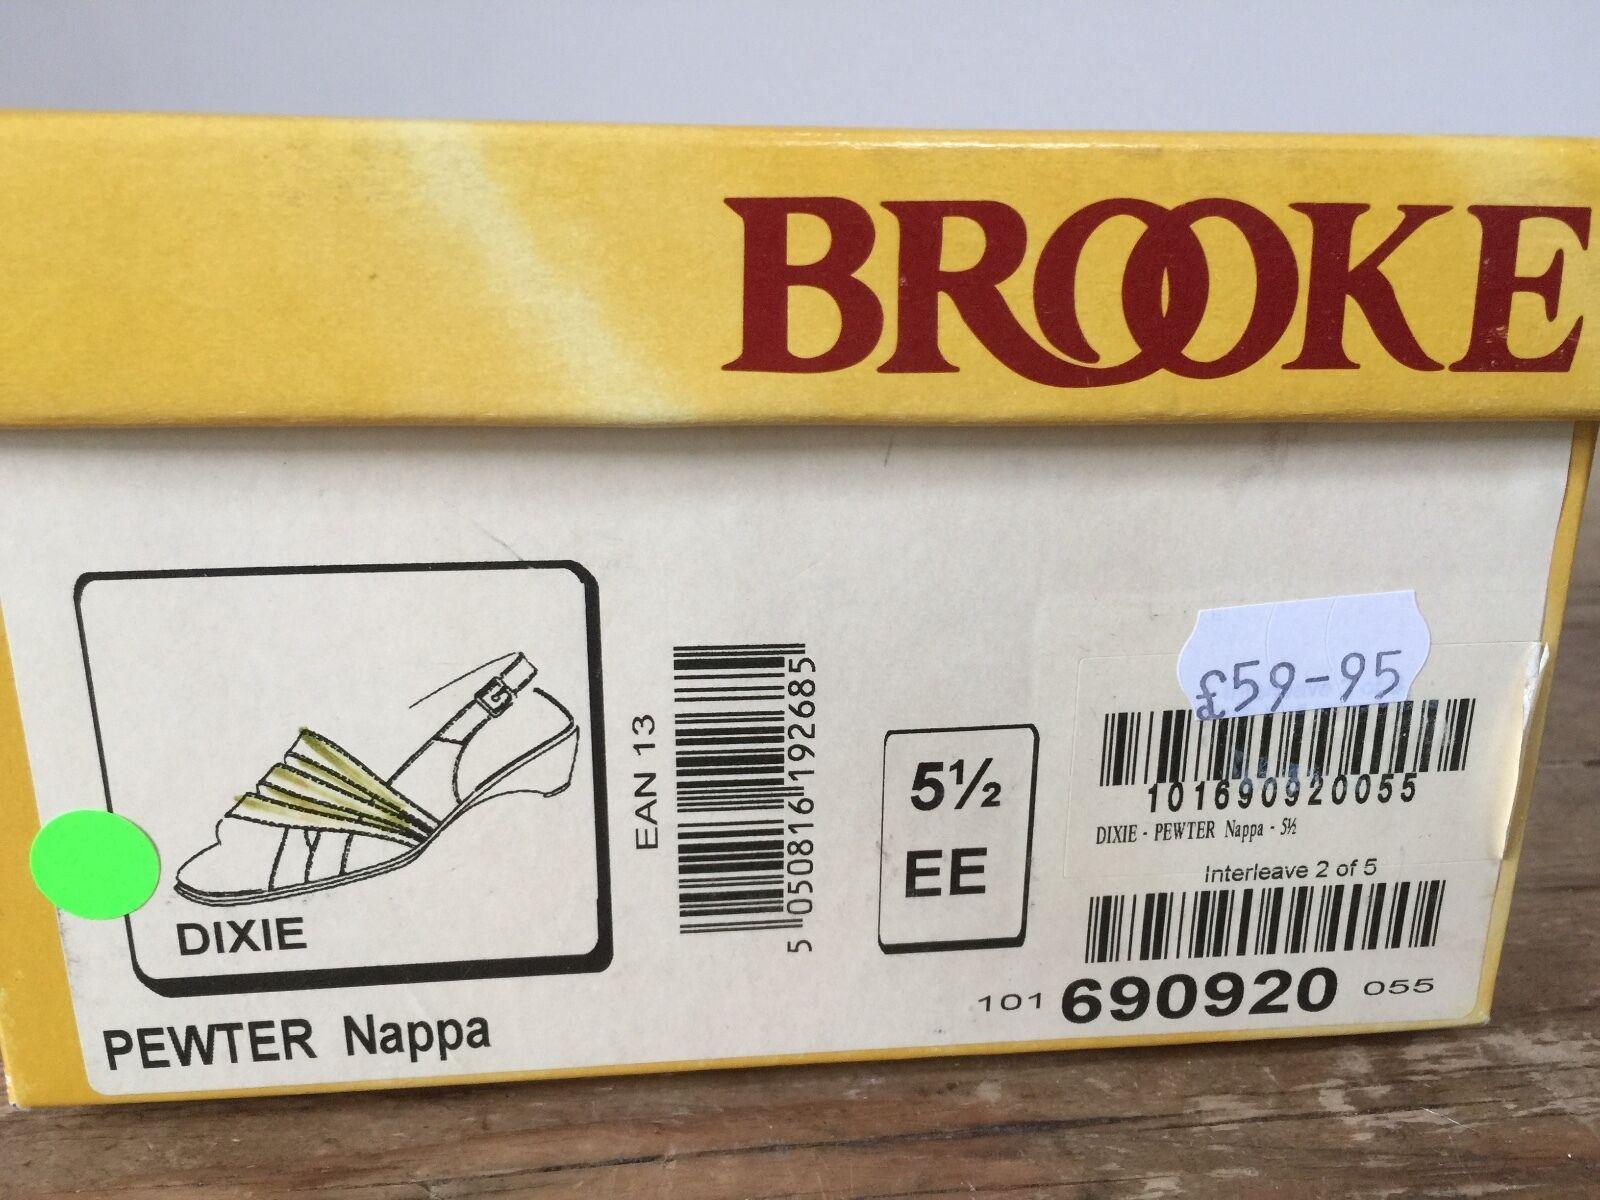 Nueva con caja 'Brooke' Estaño Cuero 1  Dixie  Estilo Cuero Sandalias-UK 5 1 Cuero 2 180c9d